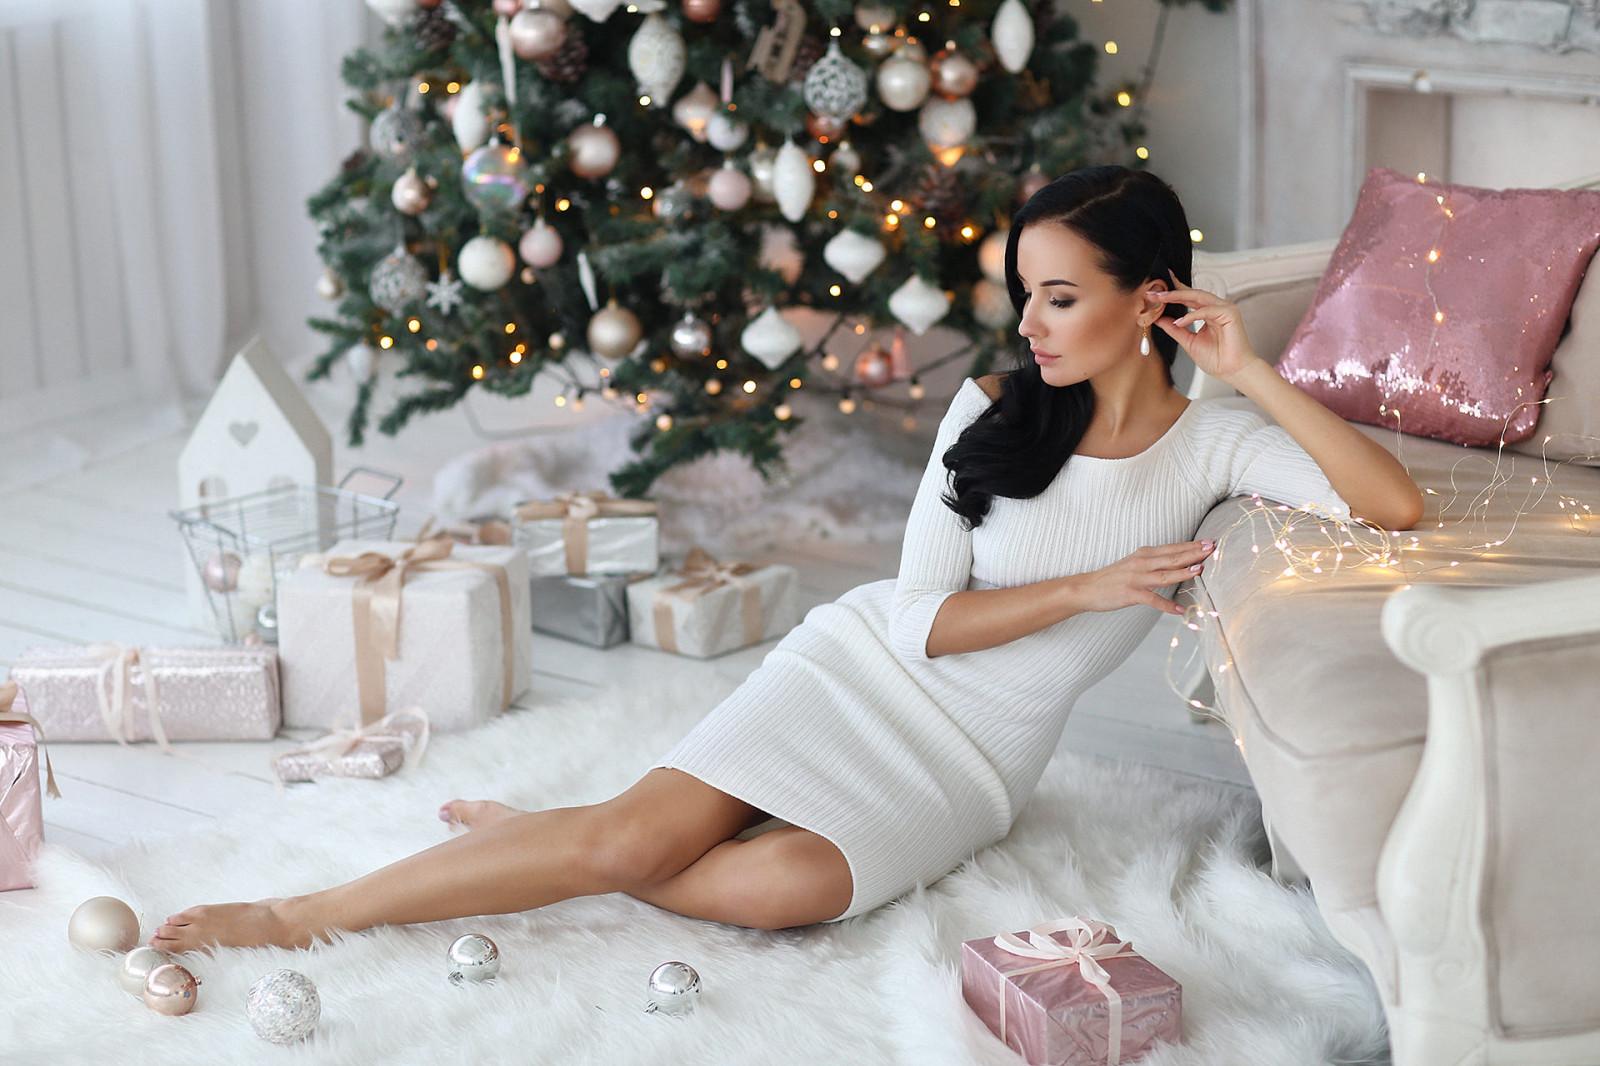 Girl In Sweatshirt And Panties In Front Of Her Christmas